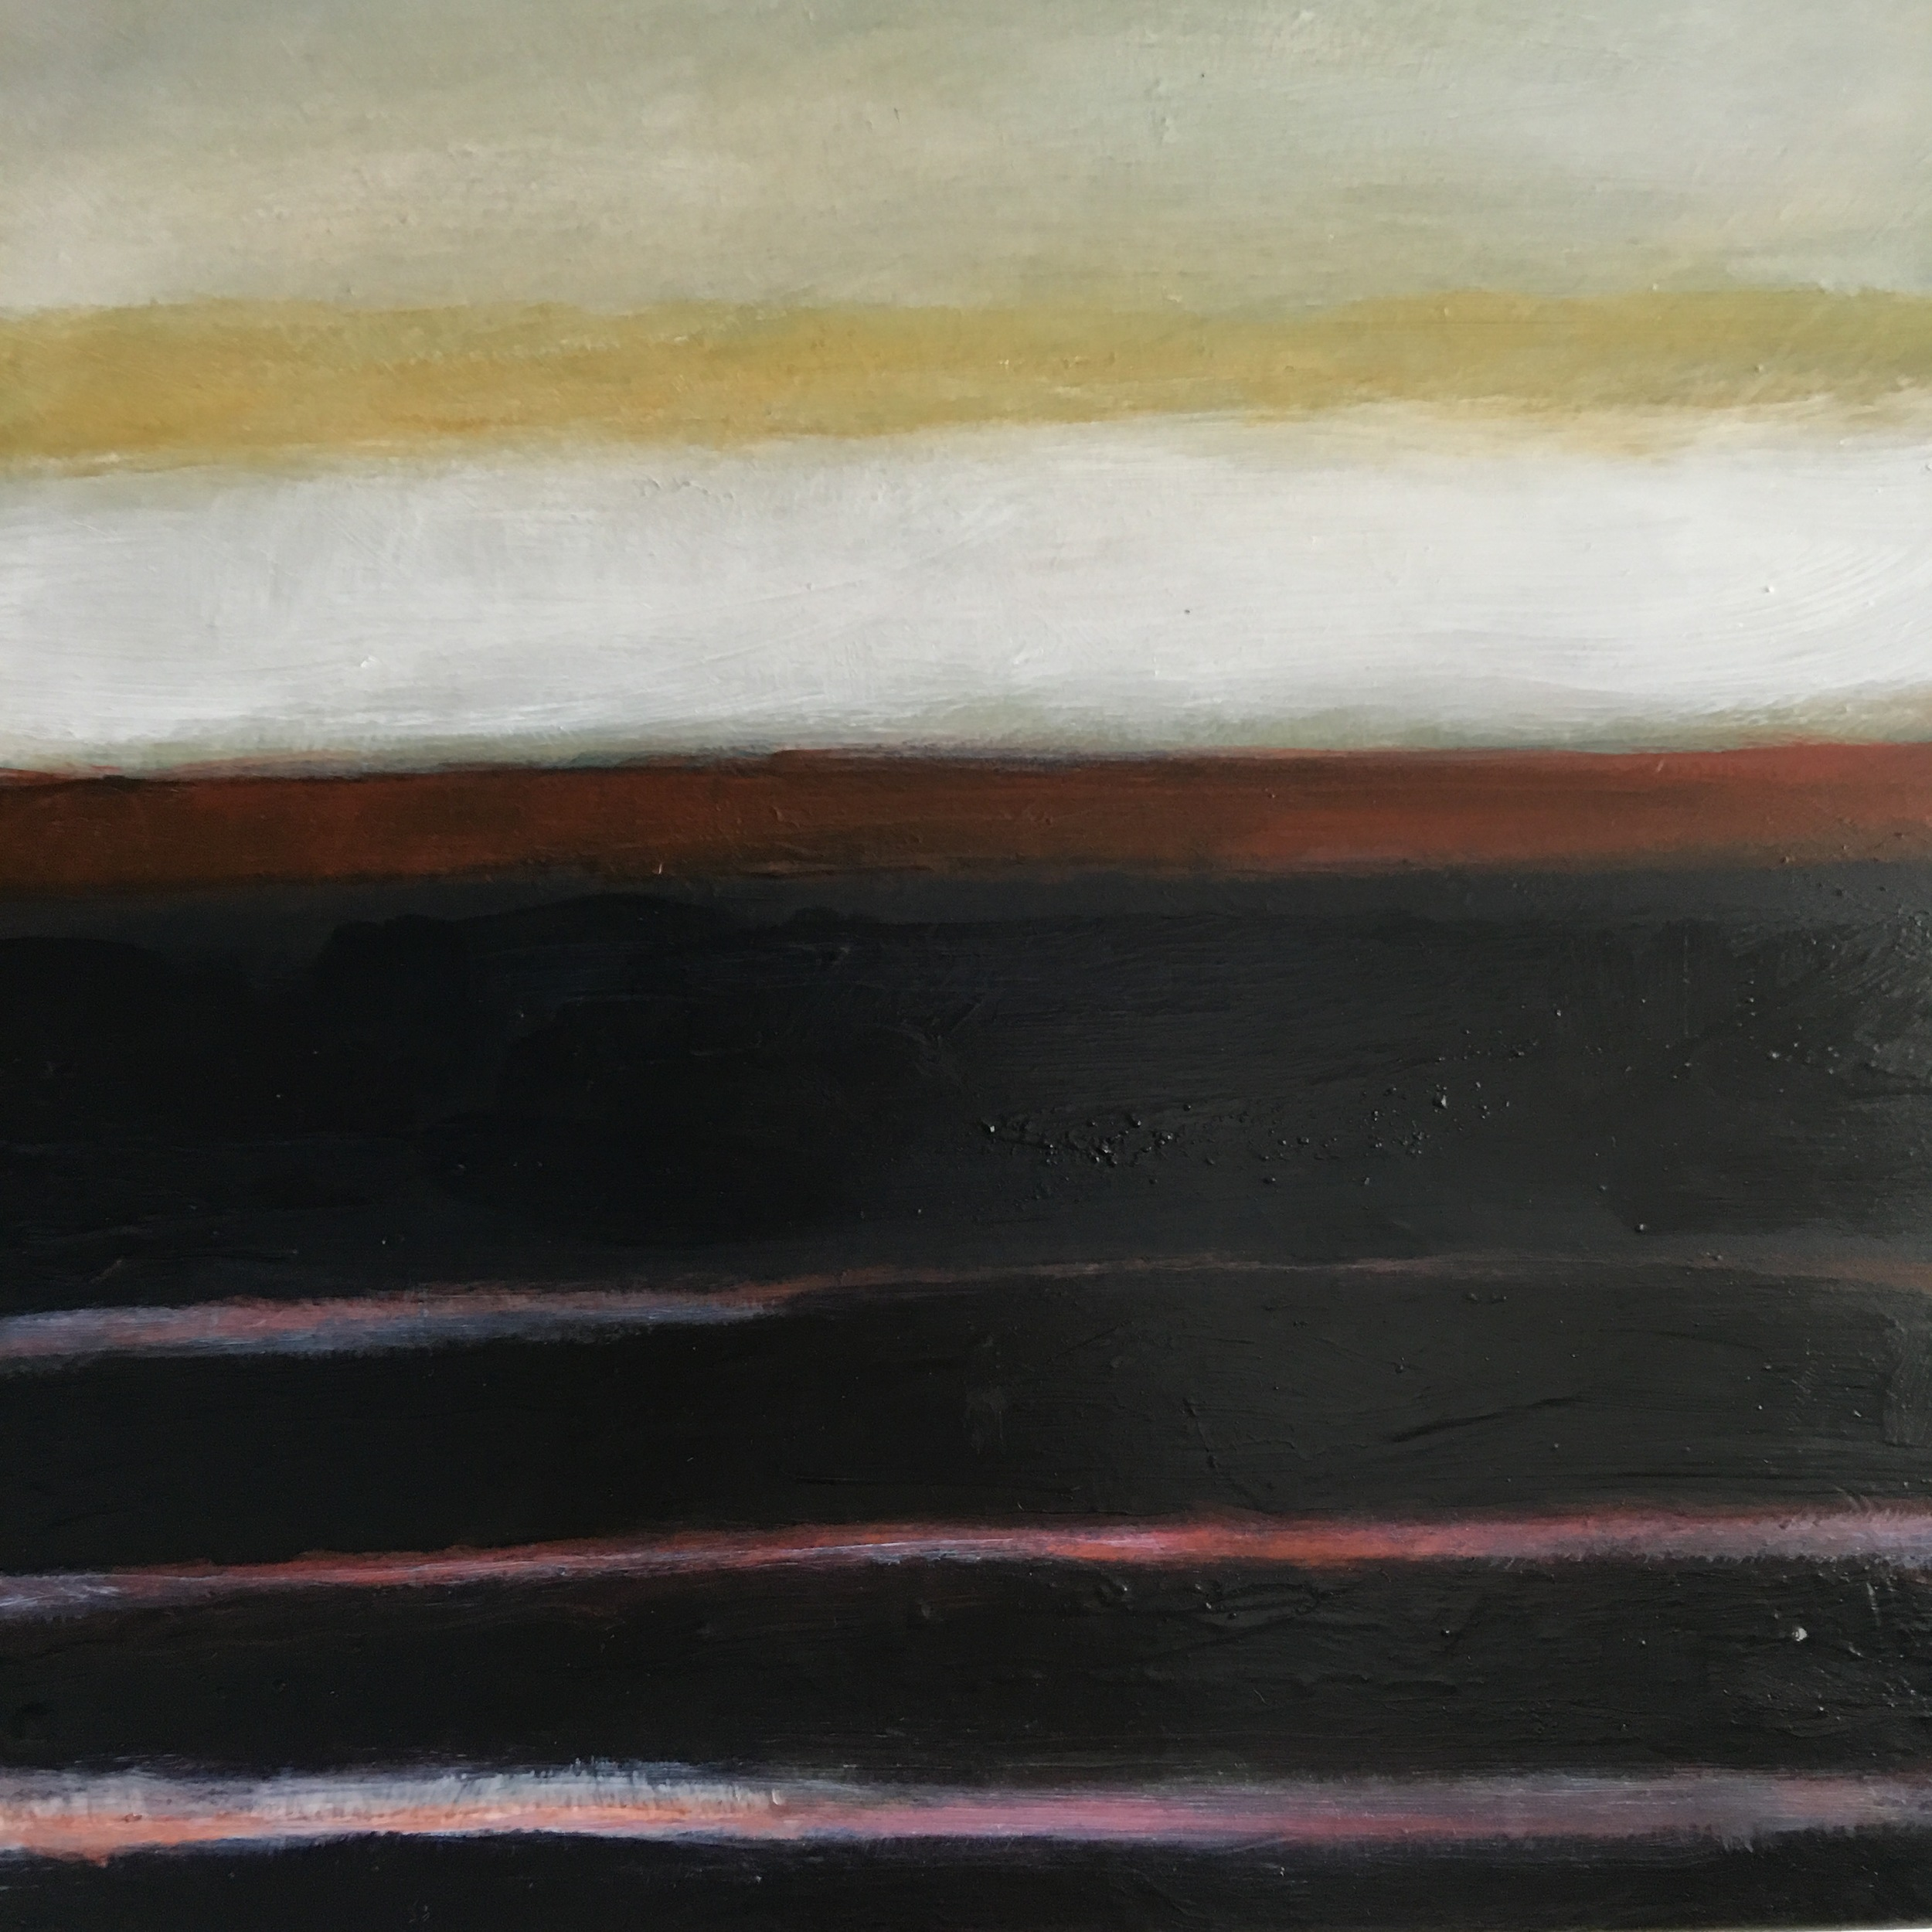 Transcending Red # Transcending Red # VI  II  oil on wood panel 12in x 12in